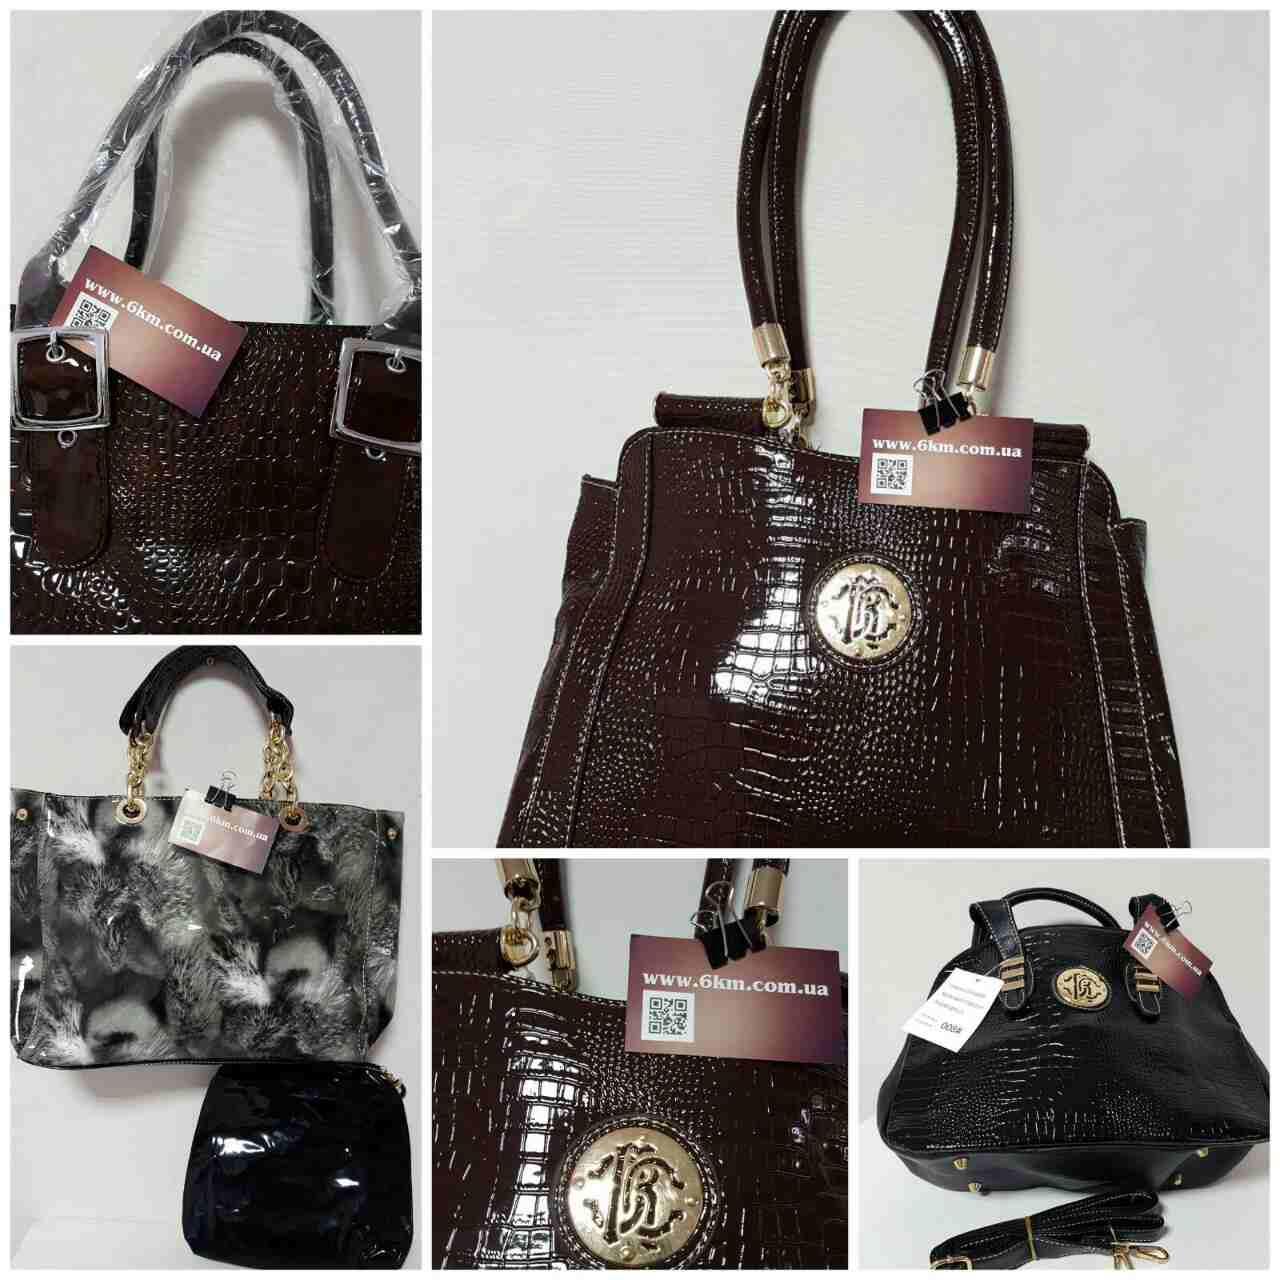 3fa3f9a8a853 Женская сумка Roberto Cavalli т 100 шт: продажа, цена в Одессе. женские  сумочки и клатчи от ...